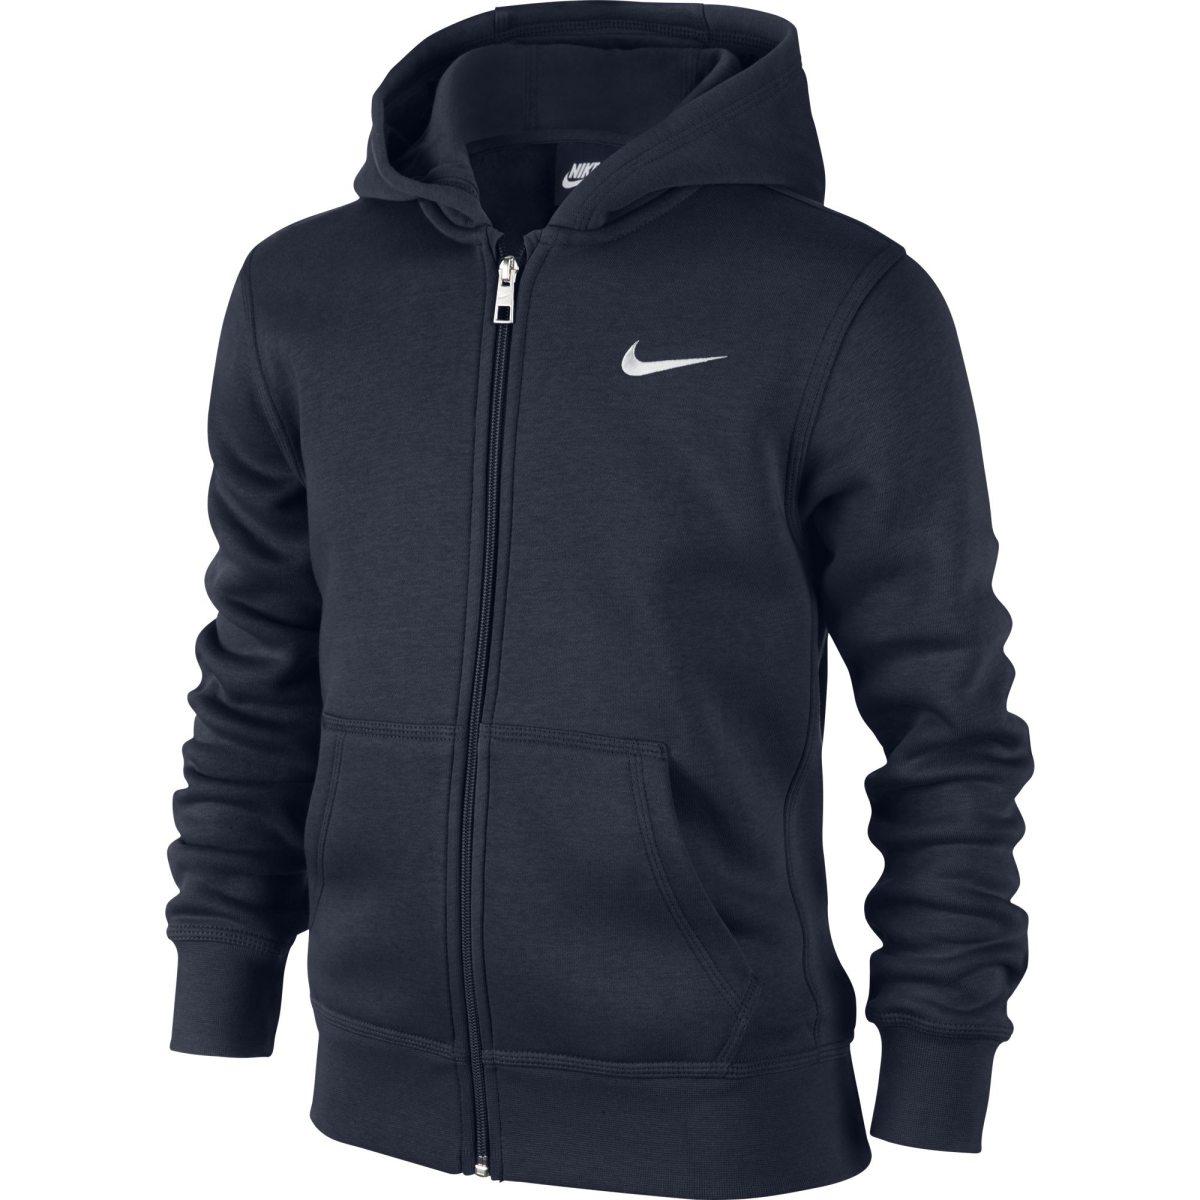 nike ya76 brushed fleece hoodie huvjacka junior fritidströjor barn   jr 6abd741f38599